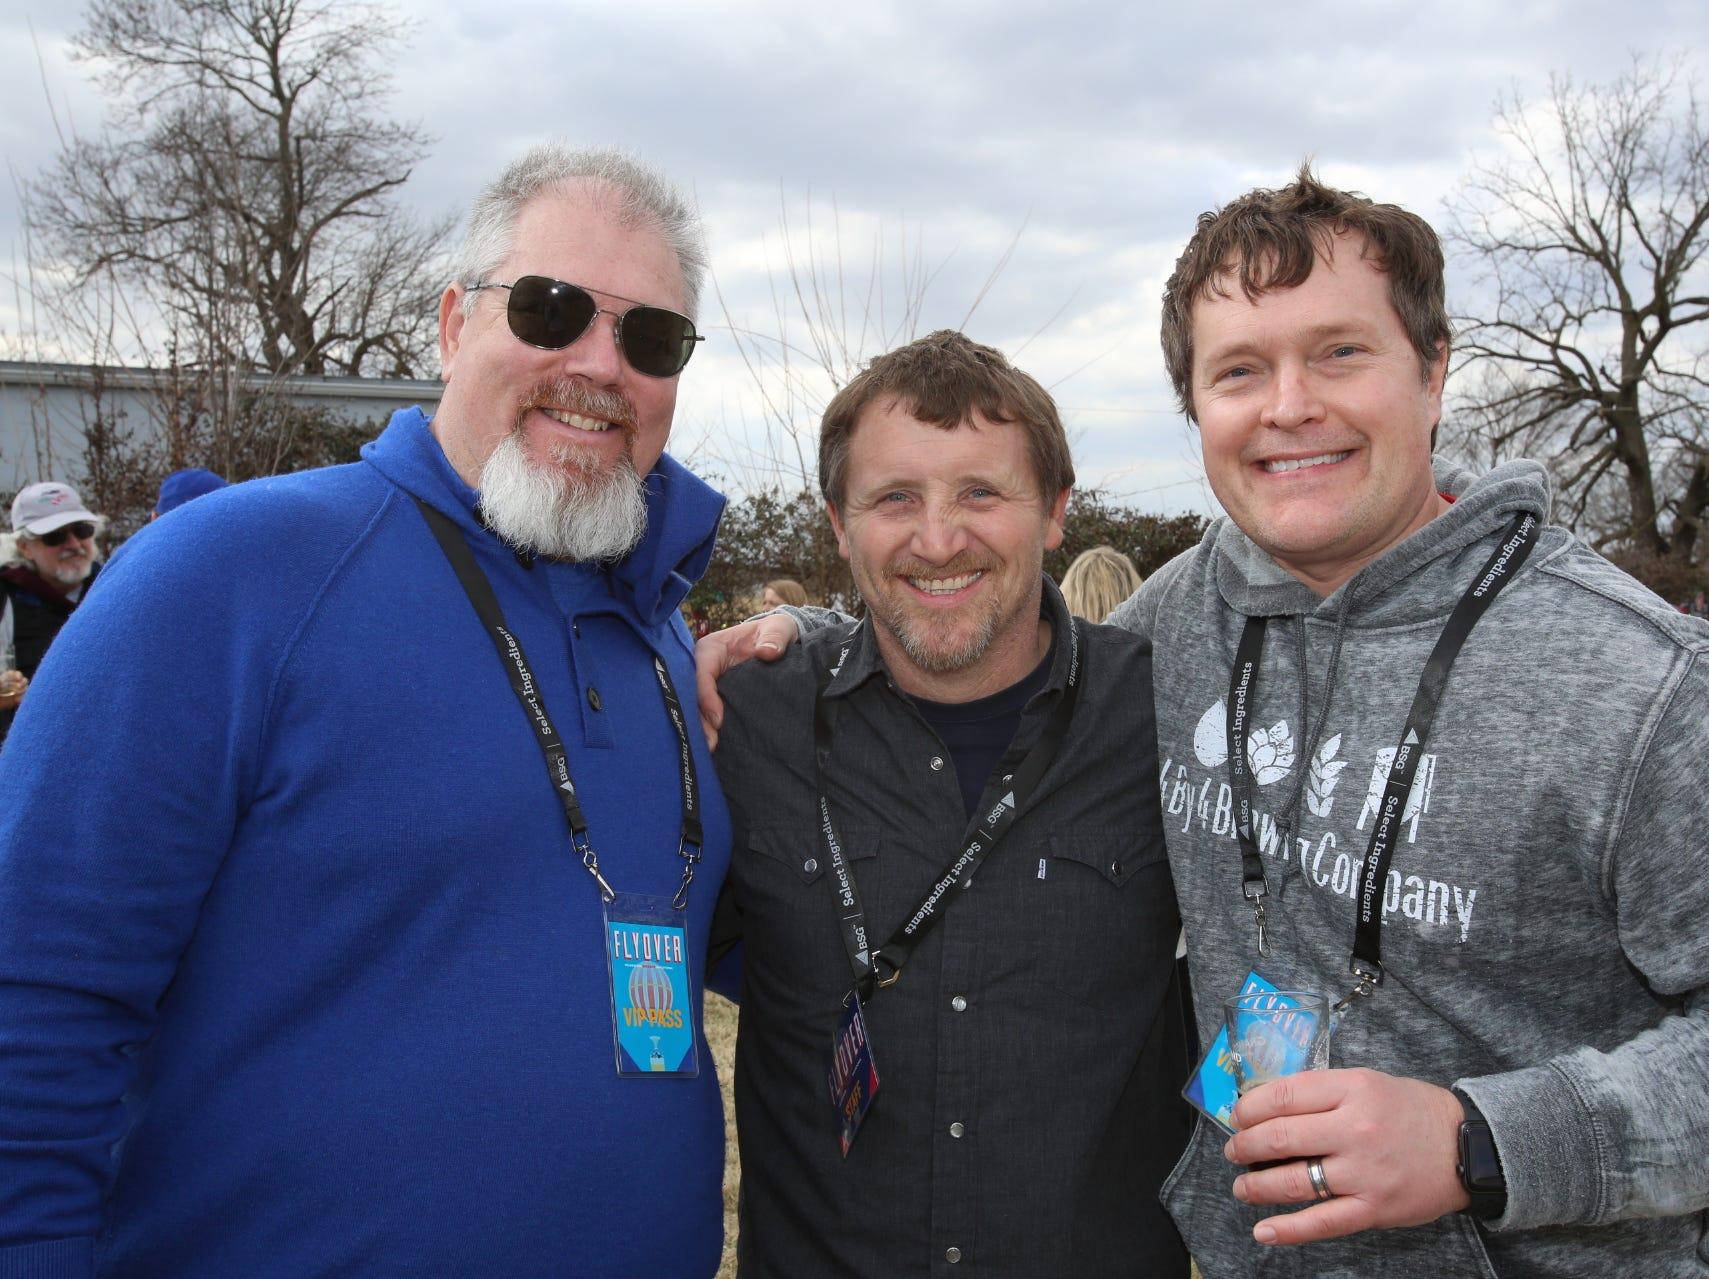 Eric Smith, Dallas Jones, and Joe Laflen